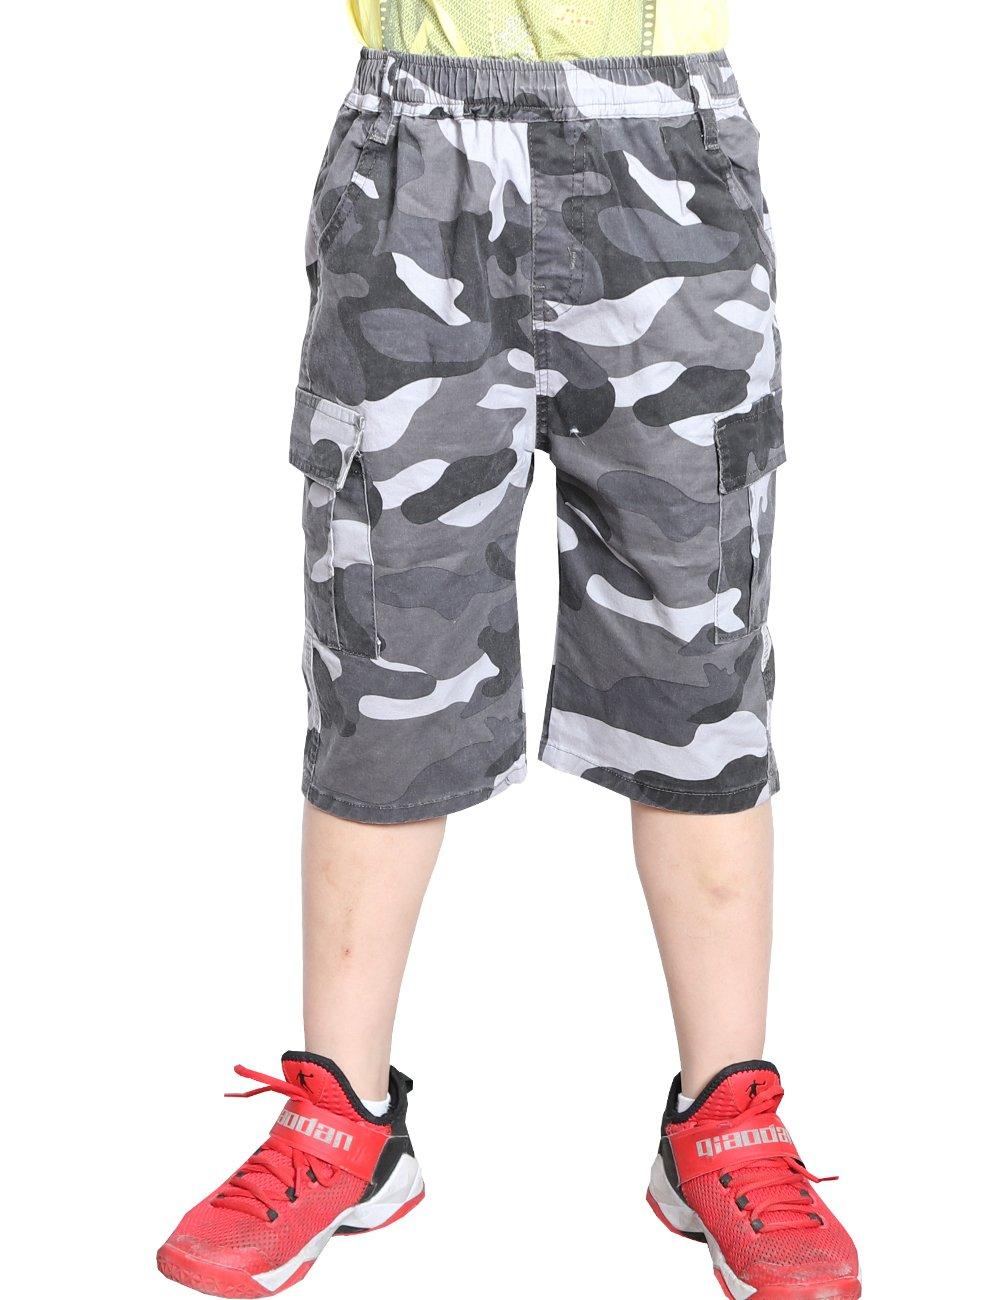 WIYOSHY Boys Camo Elastic Waist Pull On Jogger Chino Shorts for Kids 5-16 Years (Gray, 170 (Size 16))